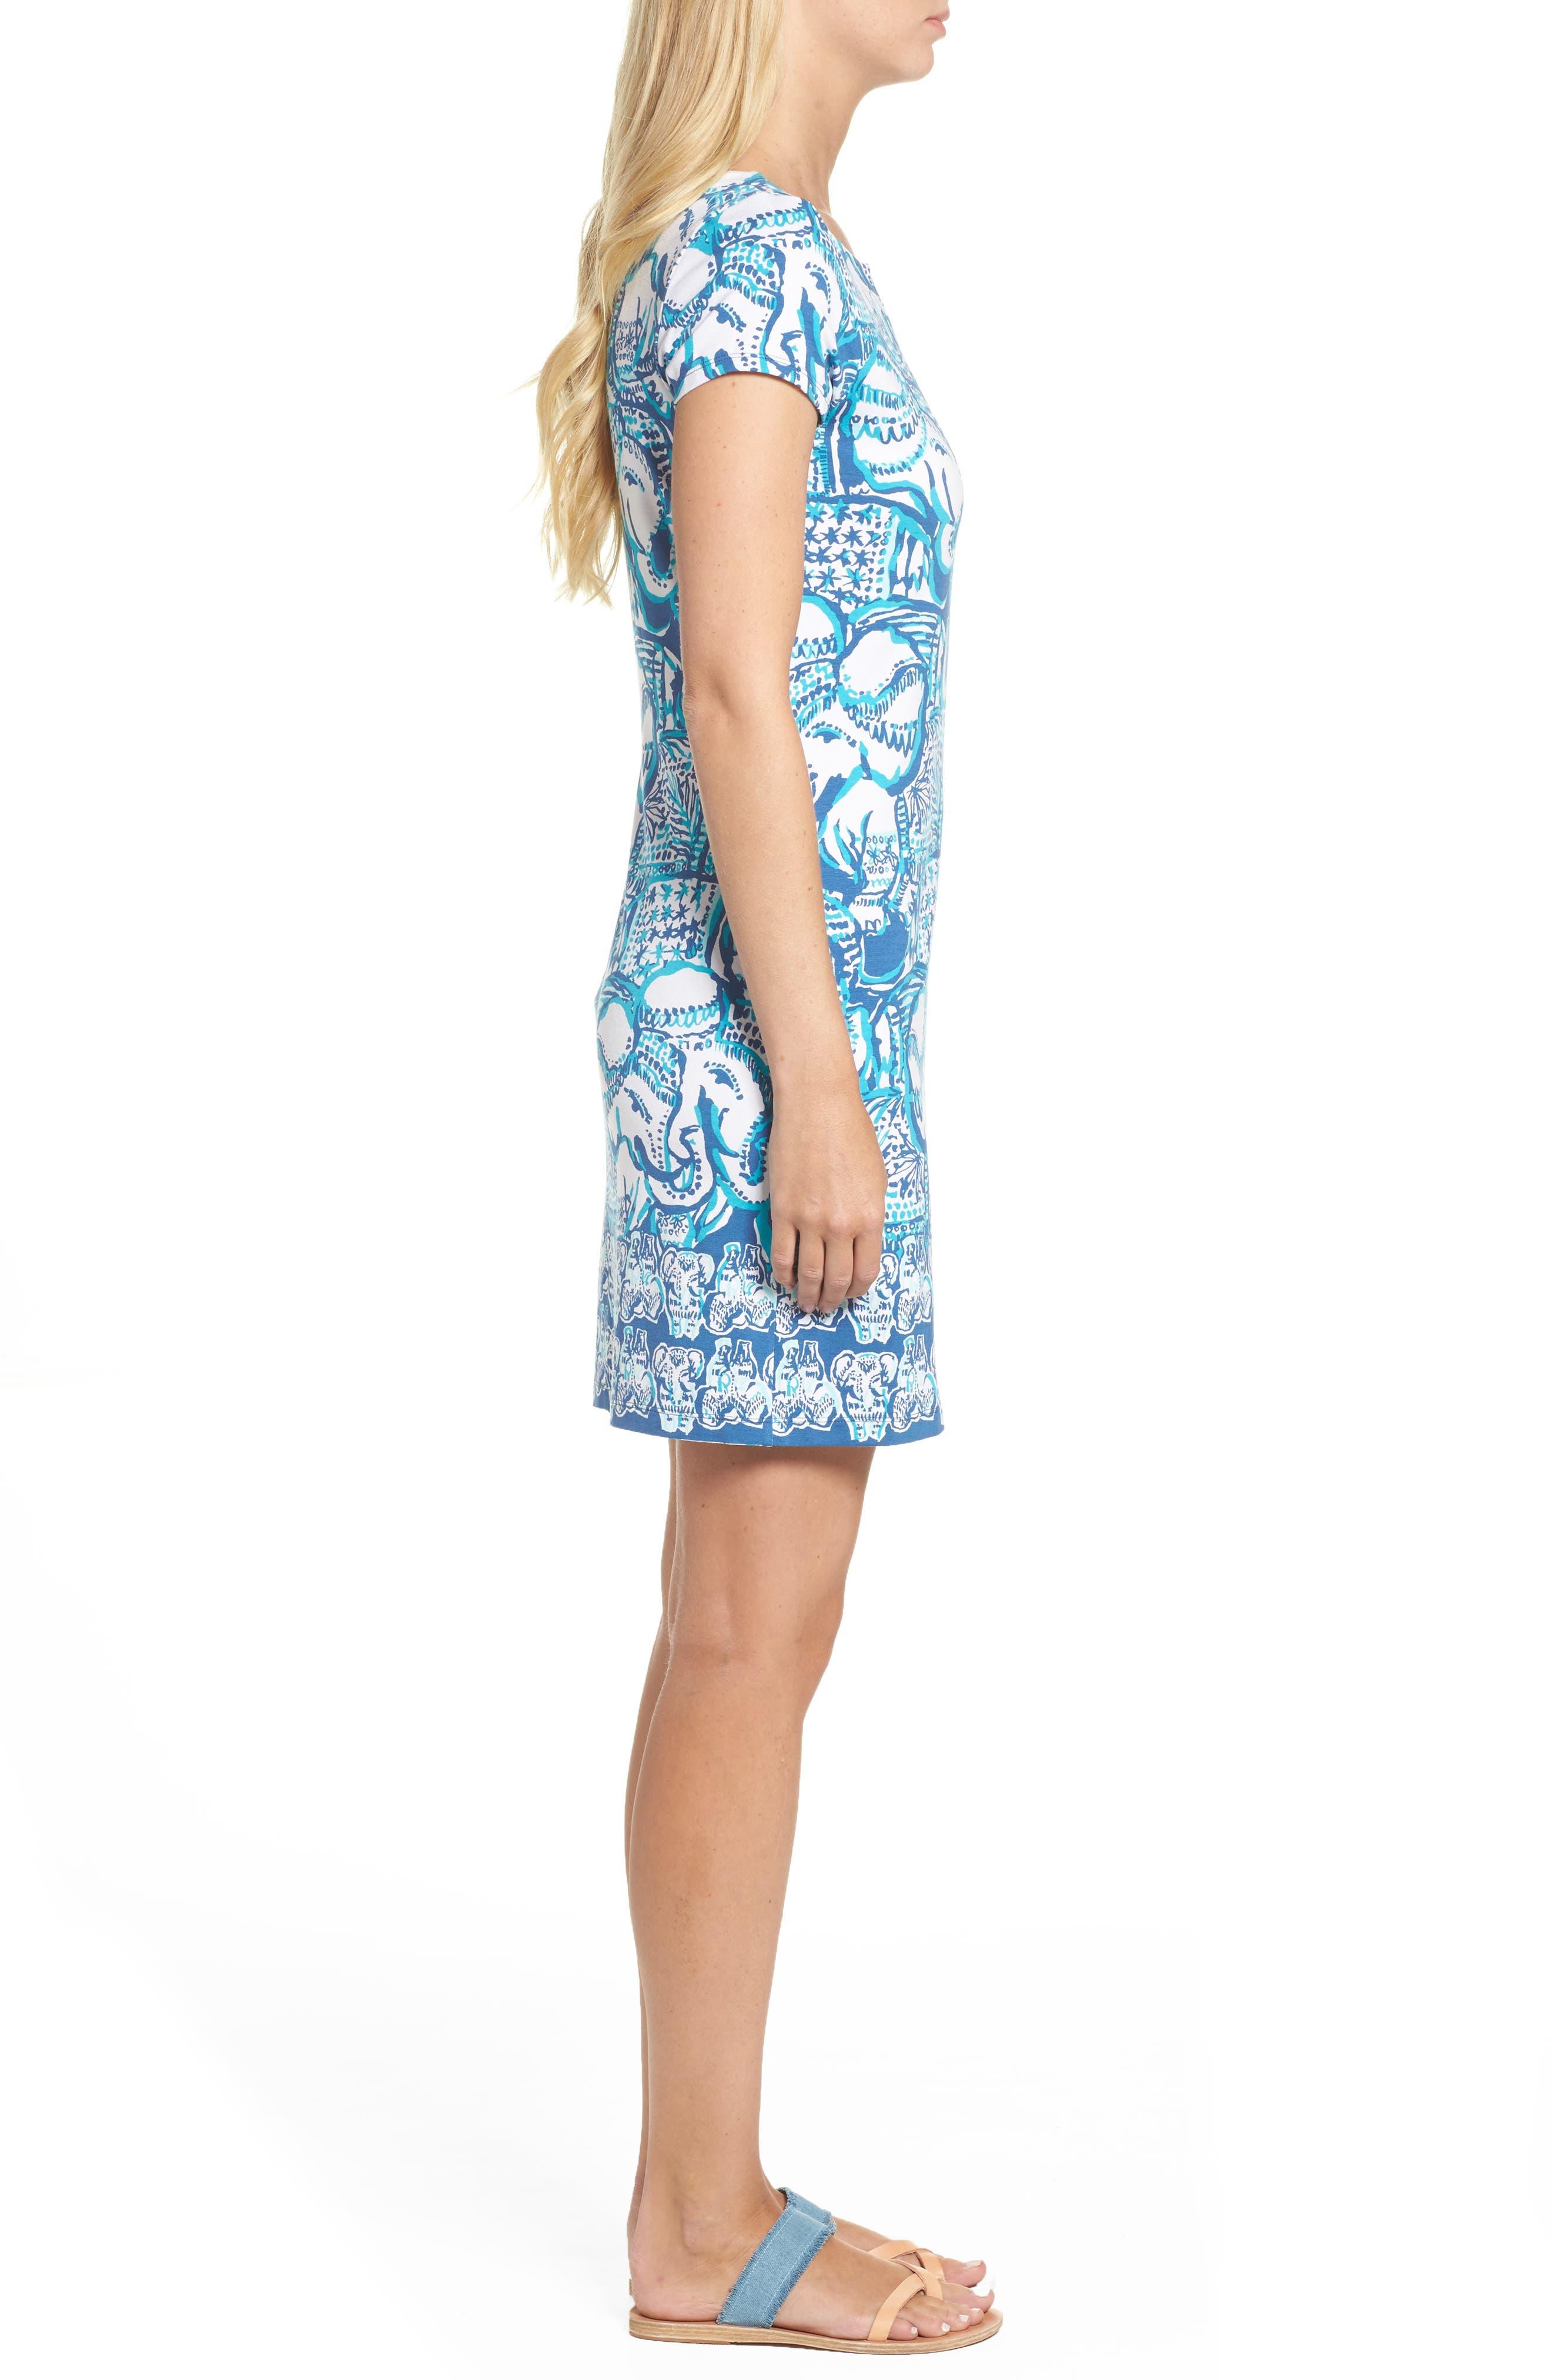 Sophiletta UPF 50+ Dress,                             Alternate thumbnail 3, color,                             Indigo